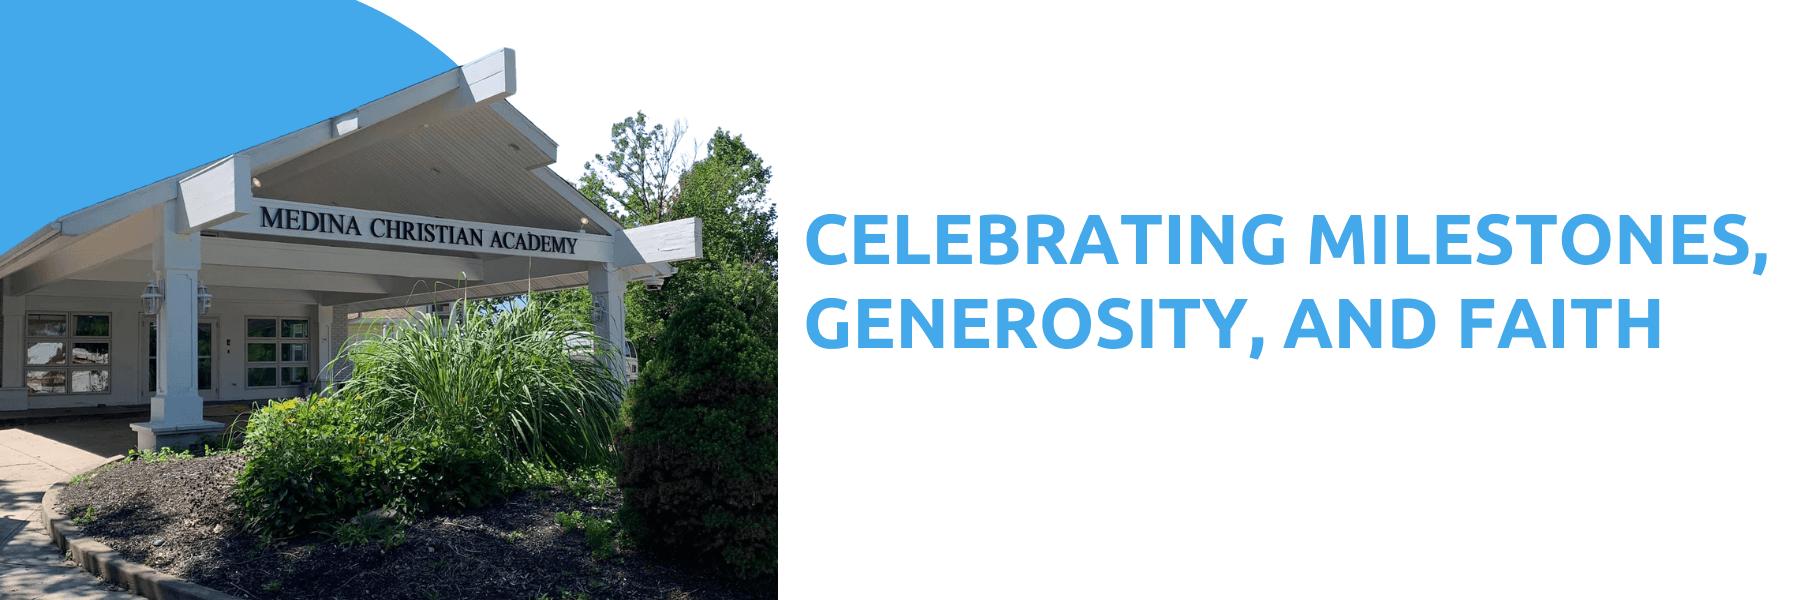 celebrating milestones, generosity, and faith